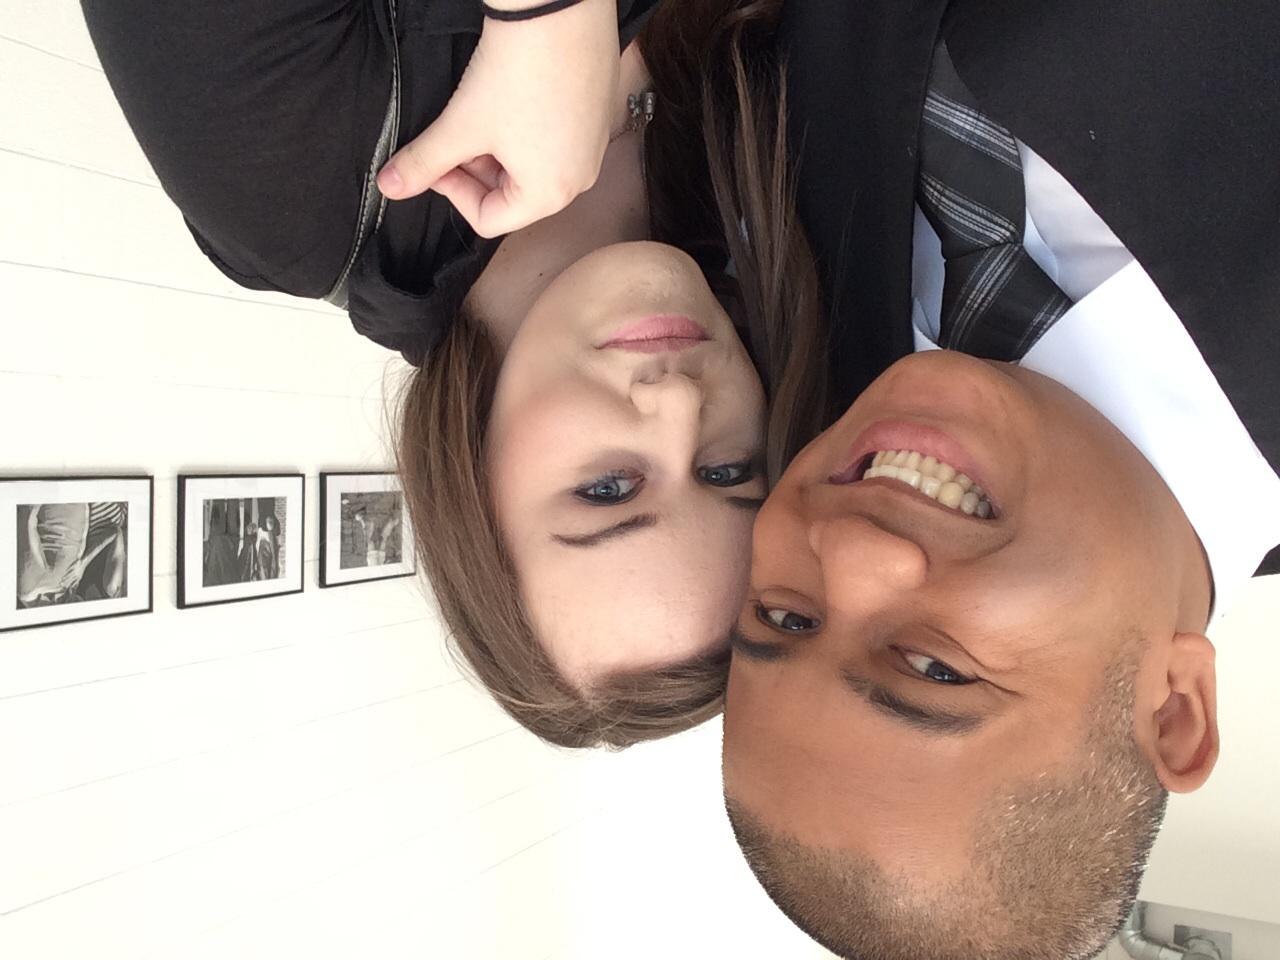 Me and Kelli Coyne (Former Classmate; Friend)